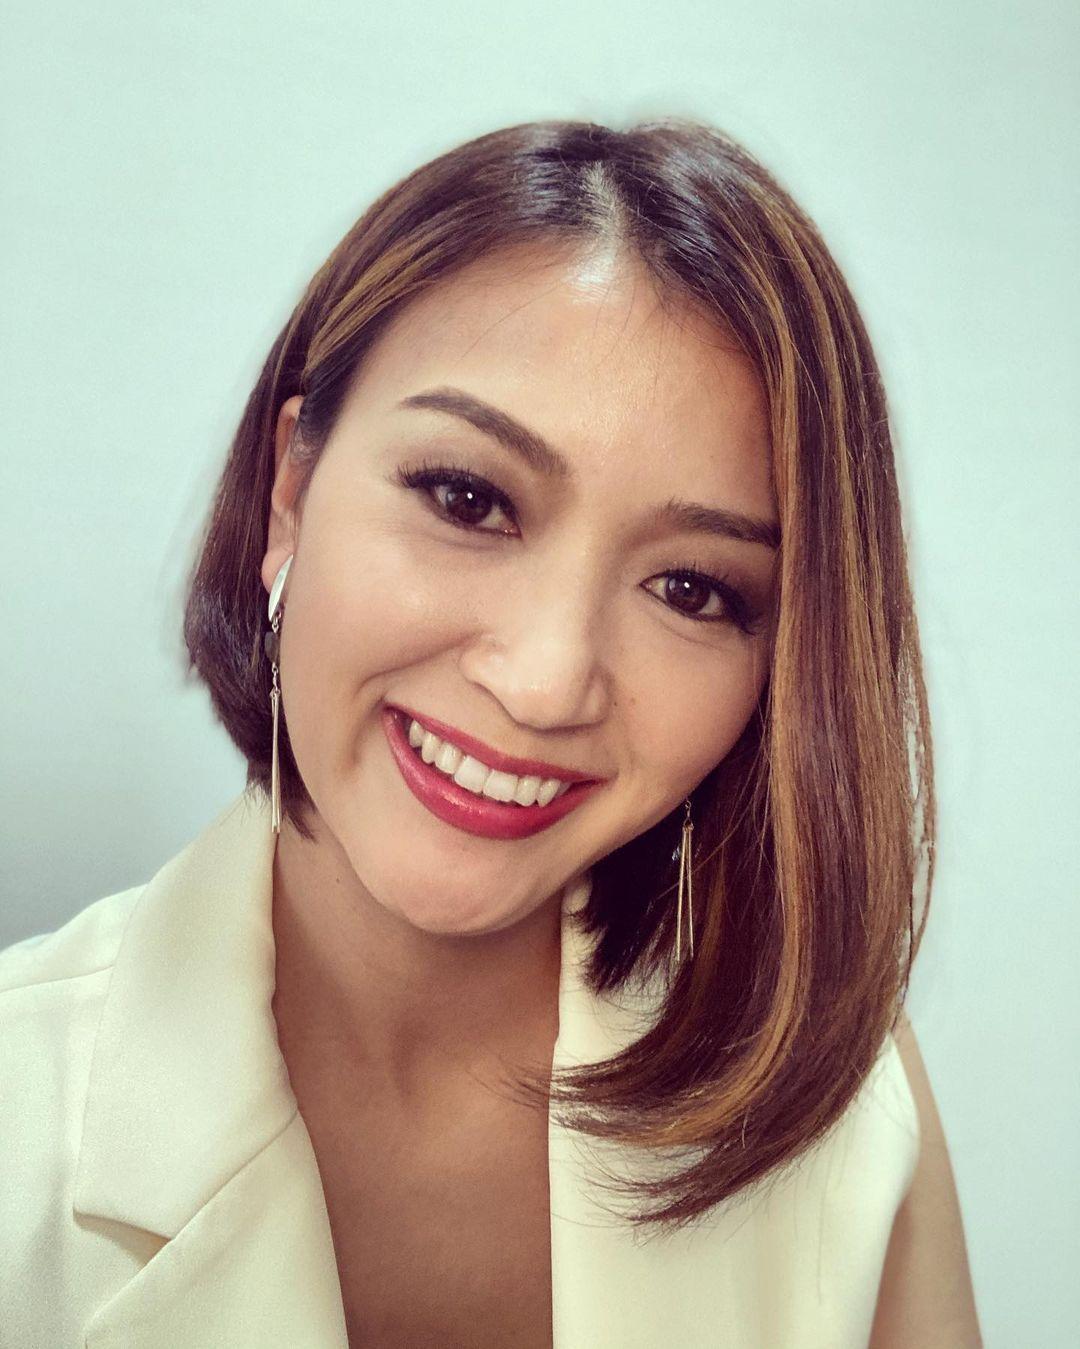 candidatas a miss universe japan 2020. final: 29 oct. - Página 2 Mh9dg5qg